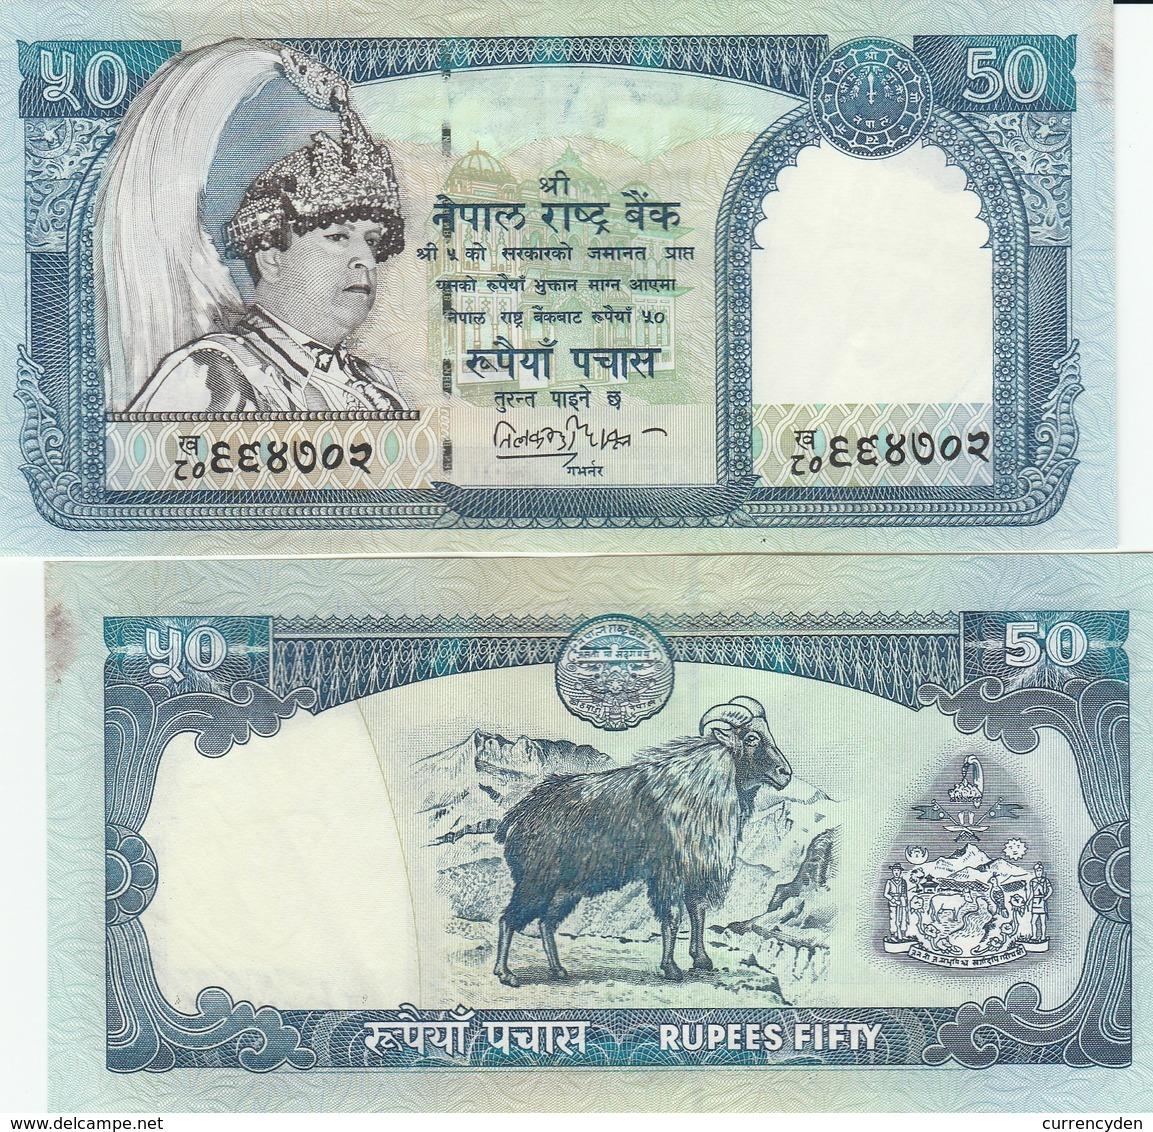 Nepal P48, 50 Rupee, King Birendra Bir Bikram, Temple / Tahr (wild Goat) UNC - Nepal